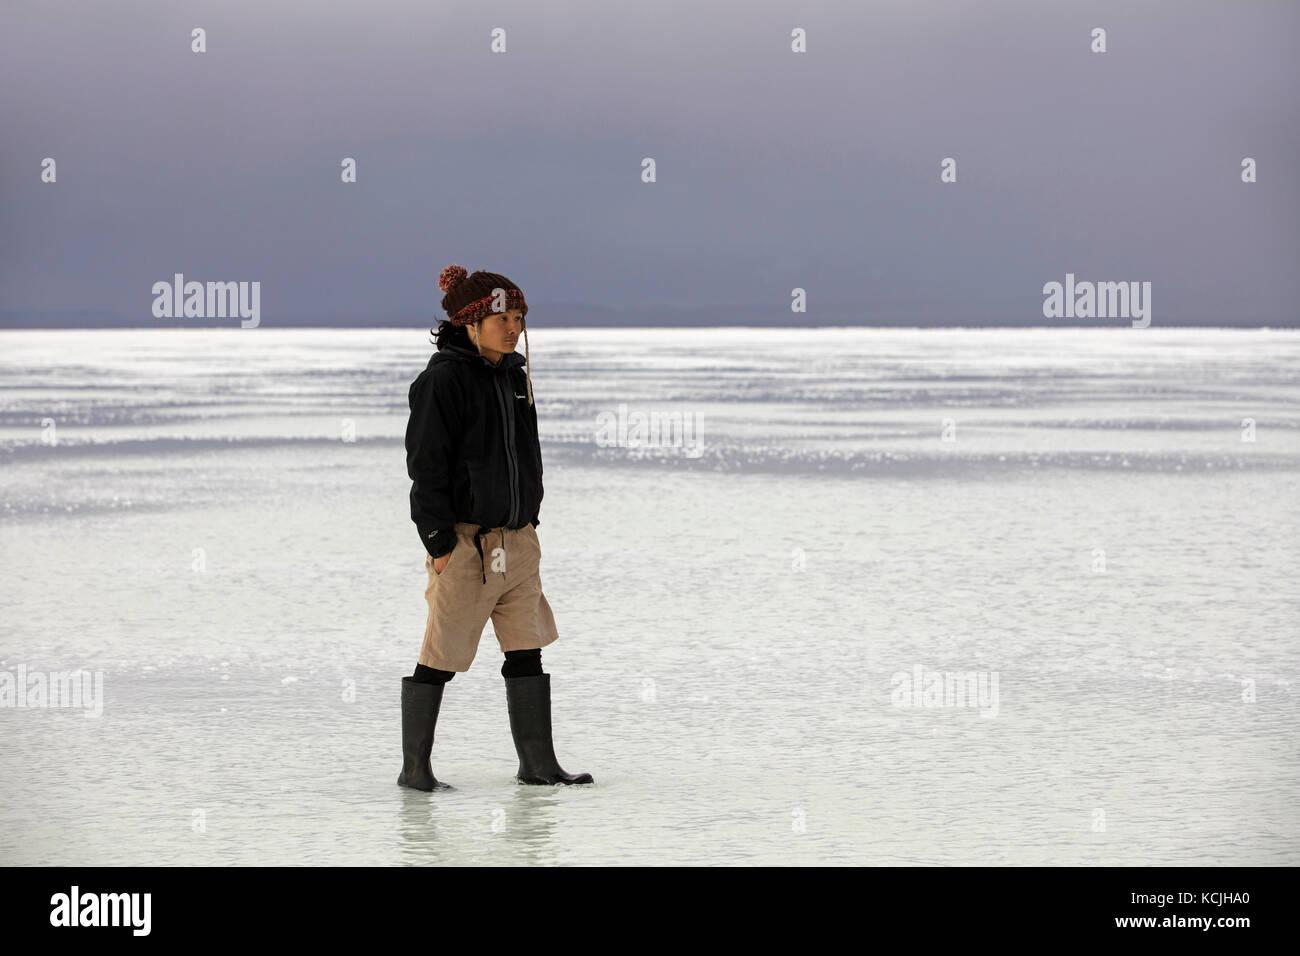 Tourist walking on the Salar de Uyuni / Salar de Tunupa covered with water, world's largest salt flat, Daniel - Stock Image